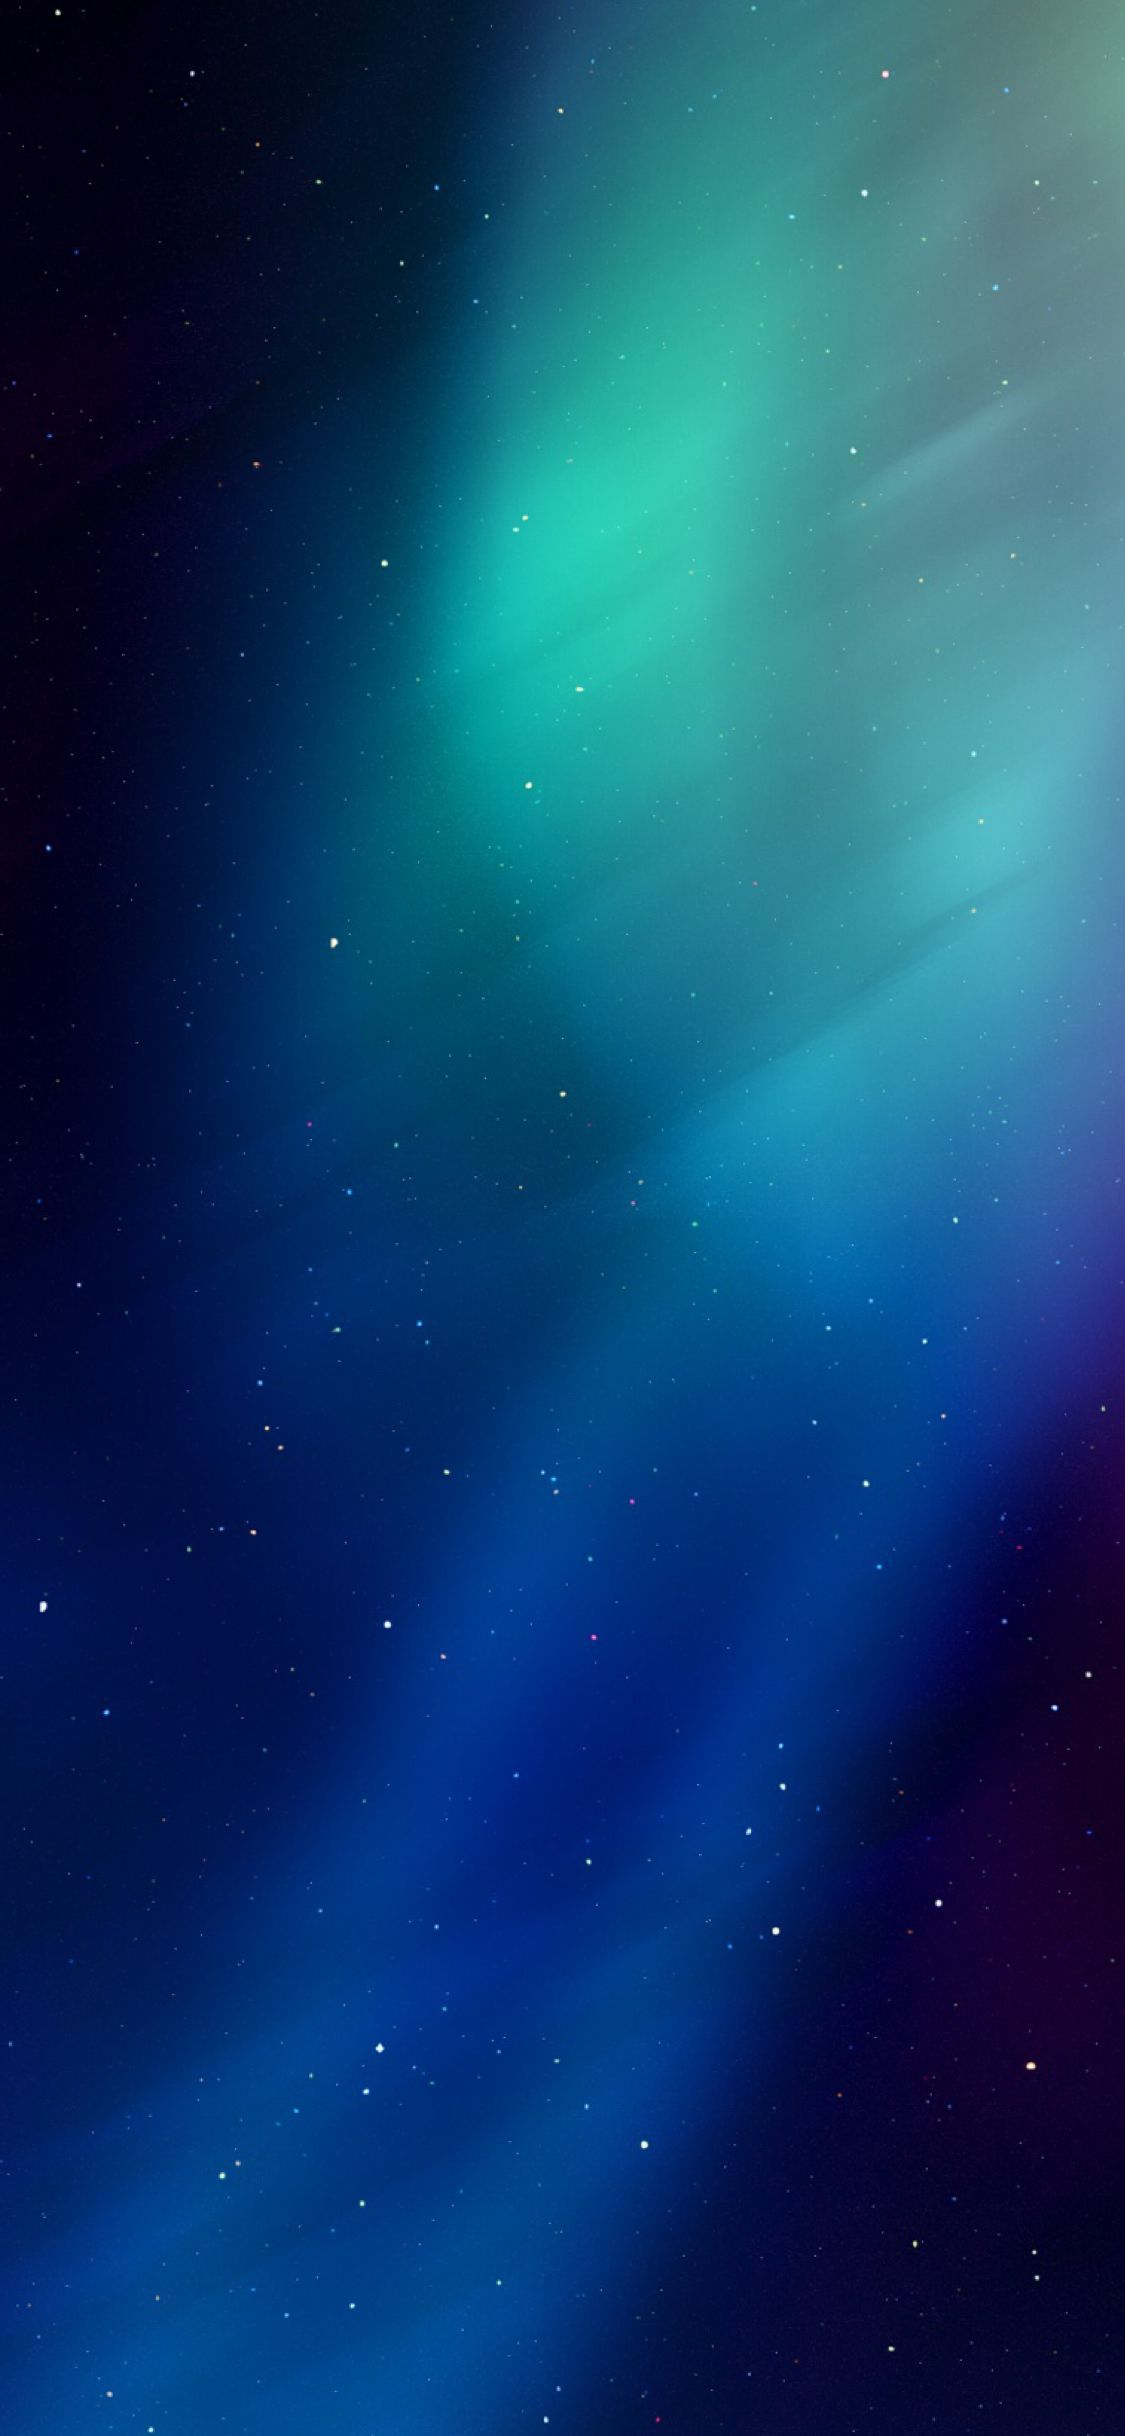 iPhone 5S Best Wallpapers on WallpaperDog